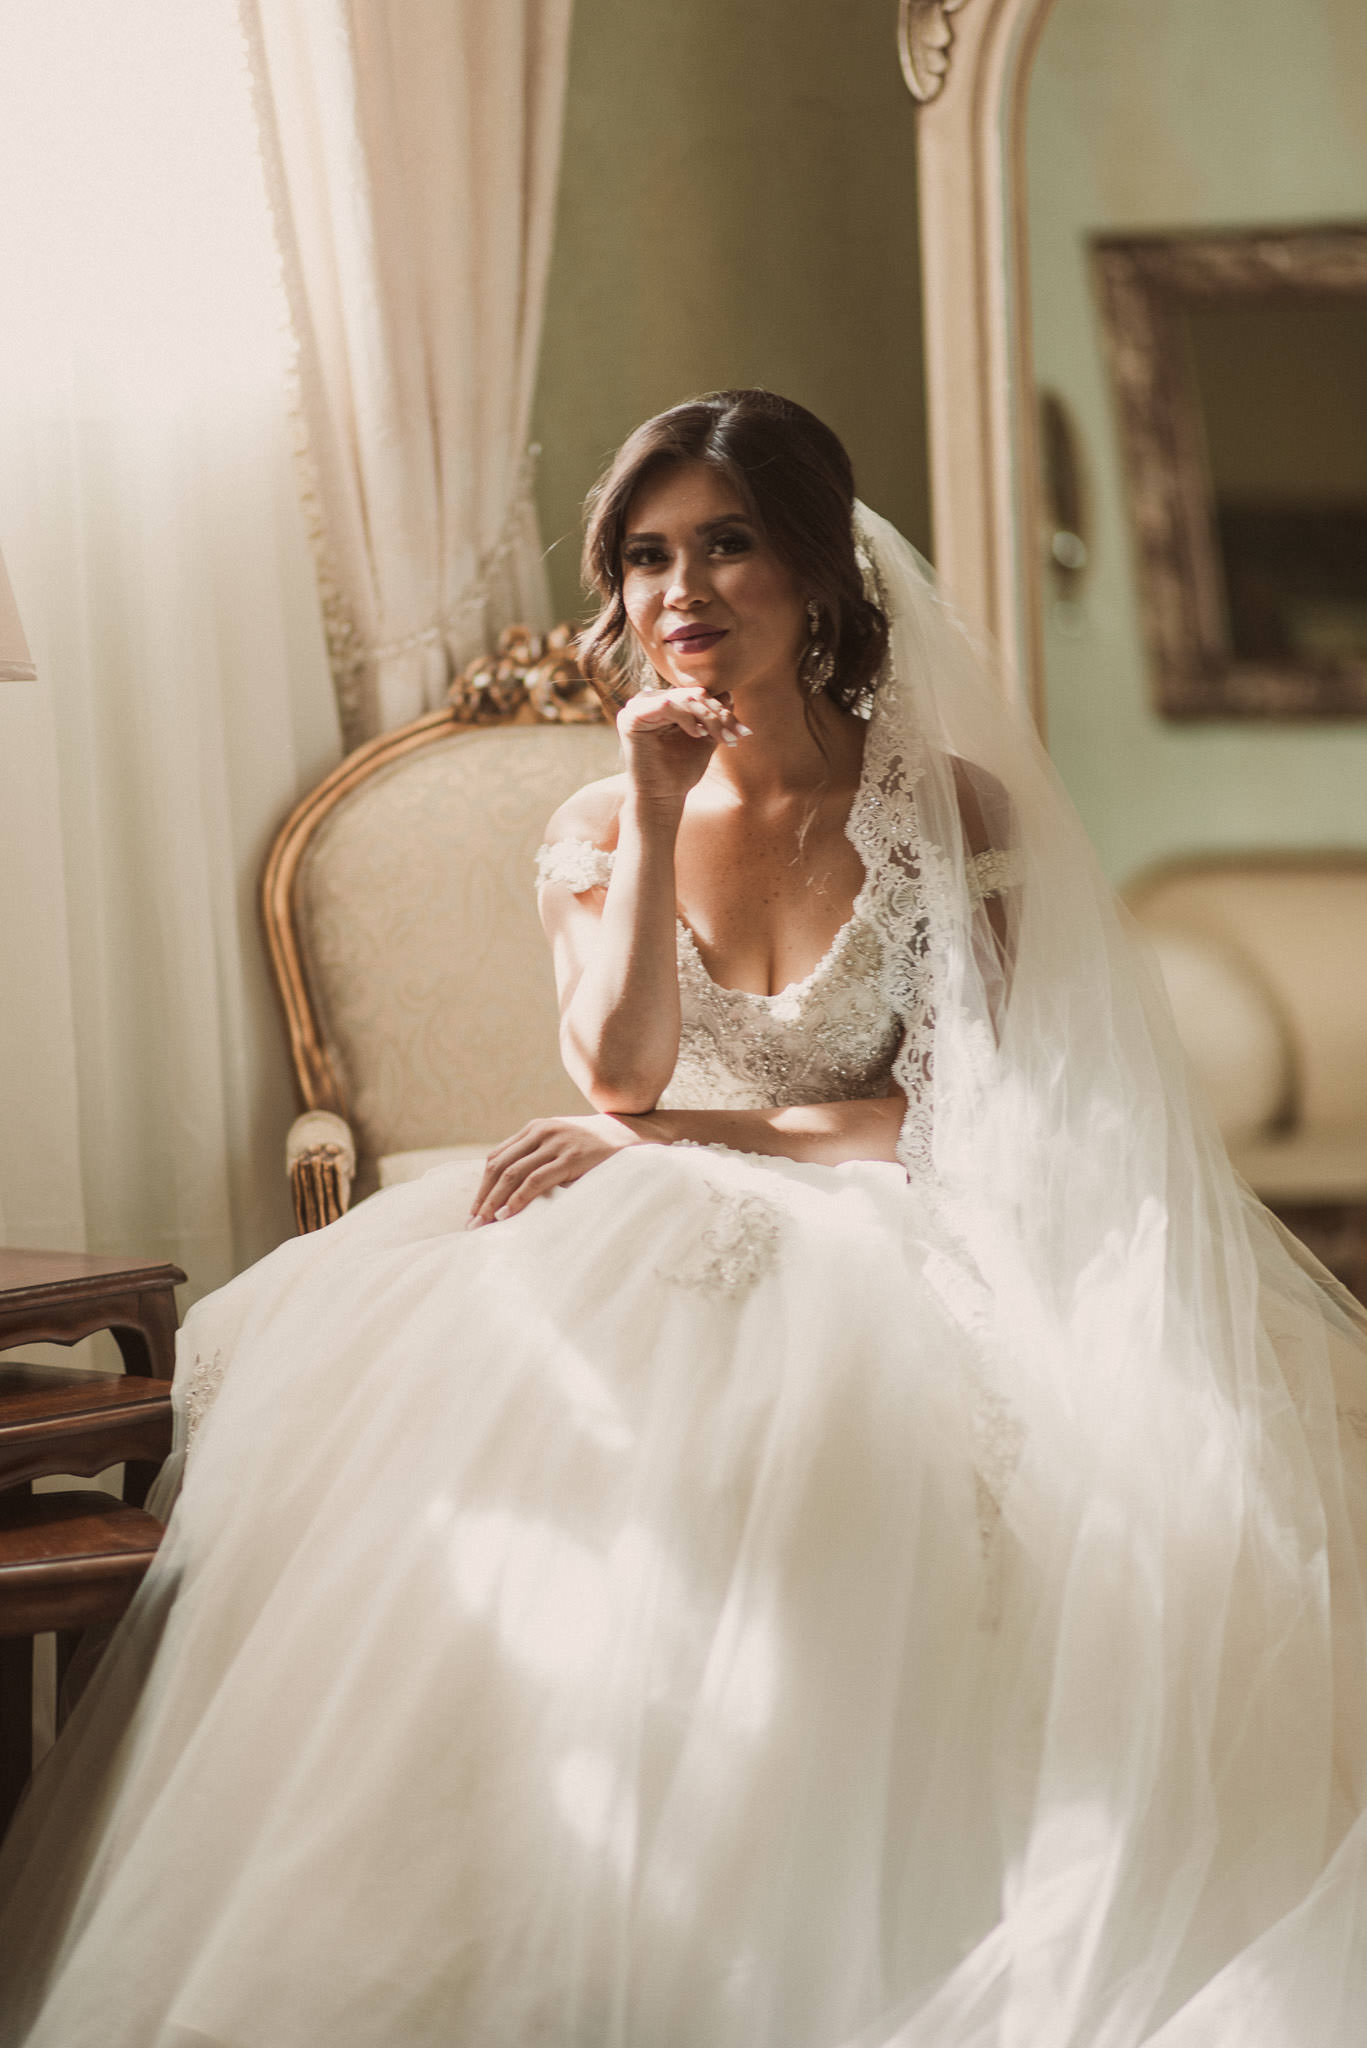 adriana-christian-wedding-re-sm-59.jpg